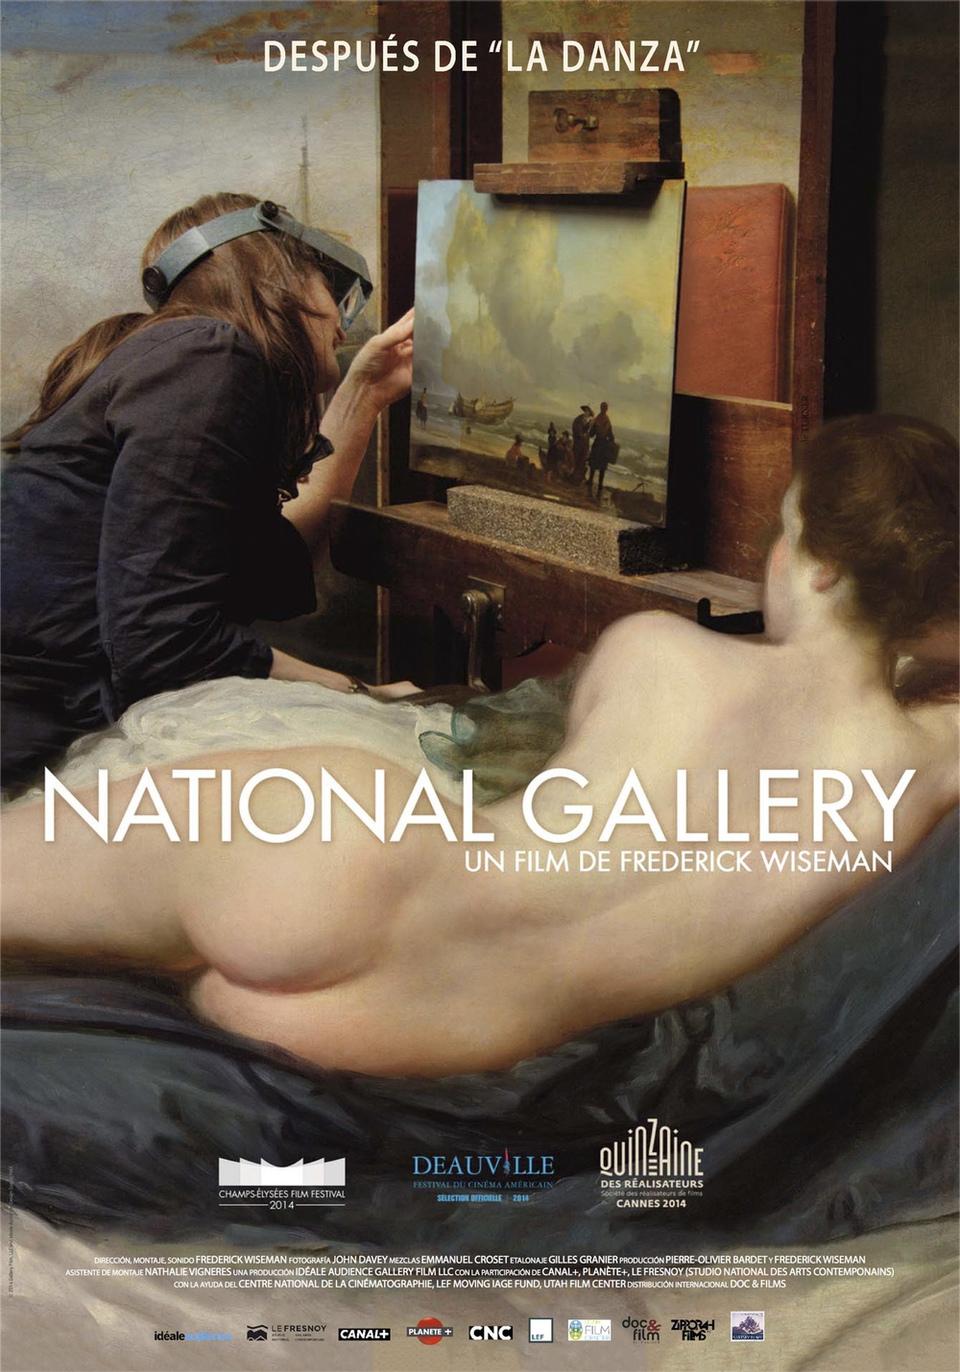 Documental National Gallery torrent descargar gratis torrent